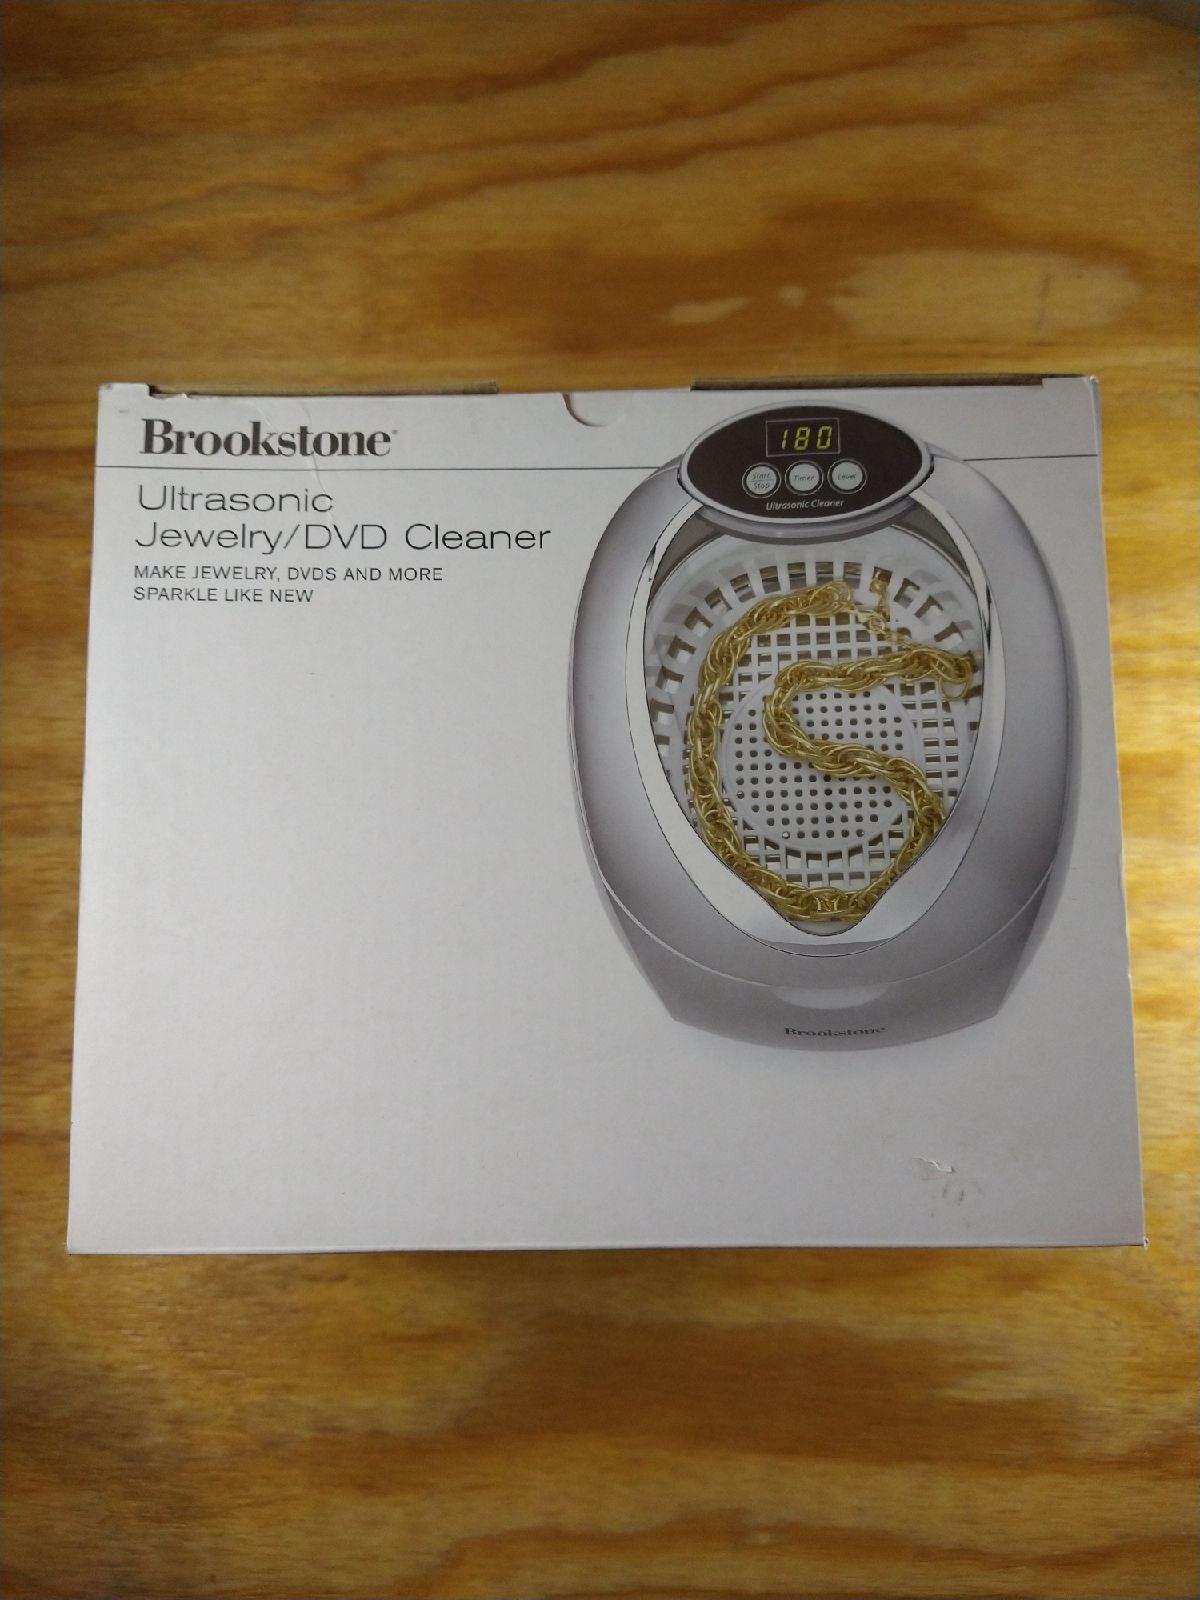 Brookstone Ultra sonic jewelry cleaner